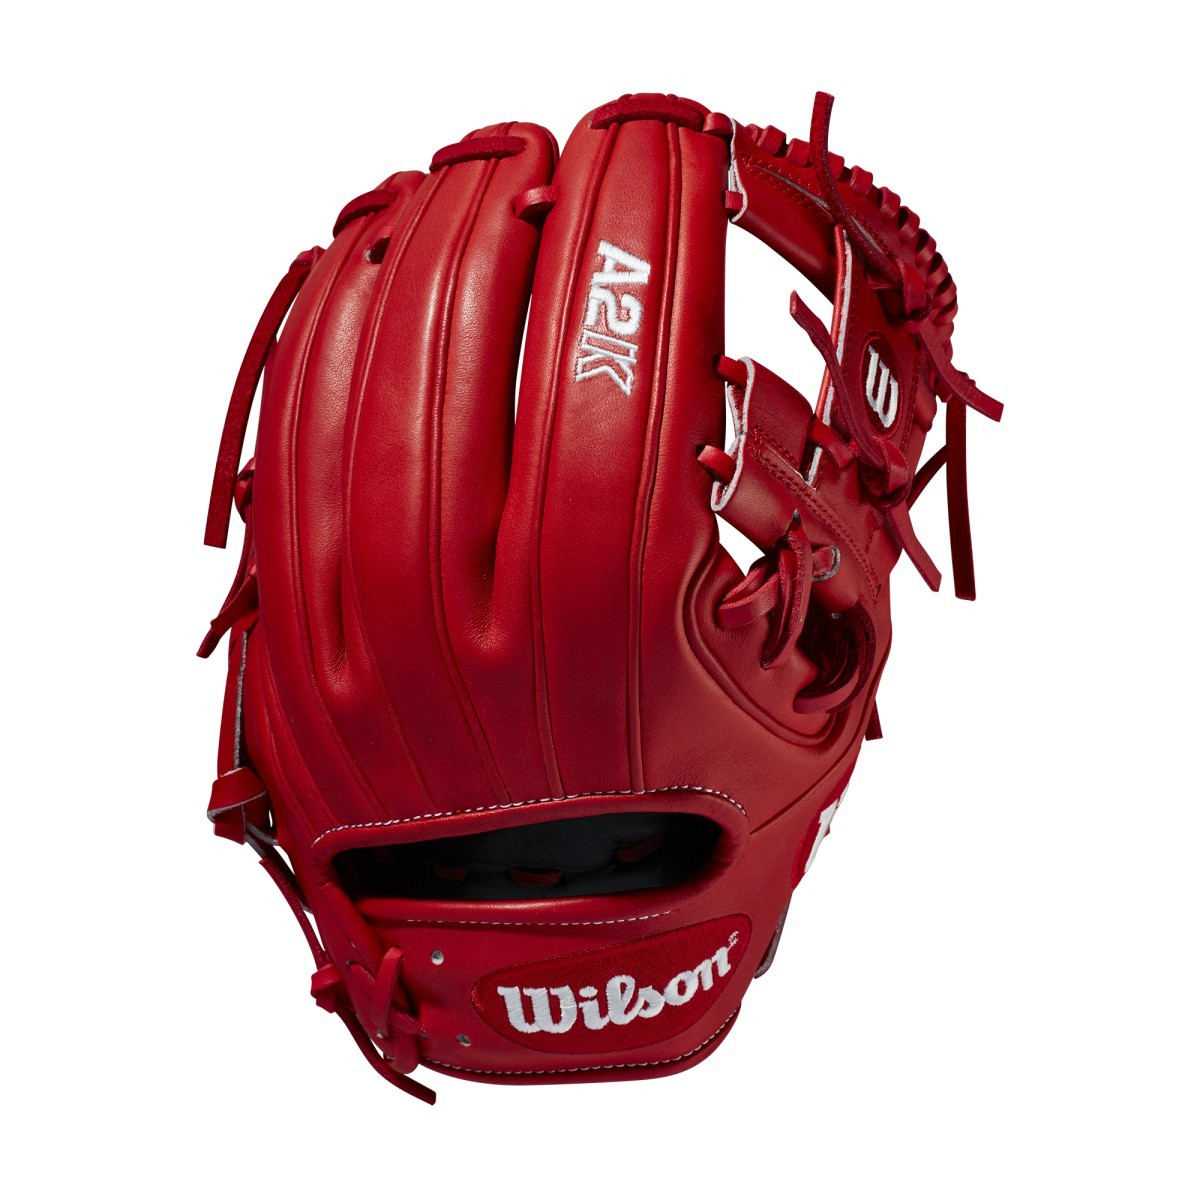 baseball glove portland or